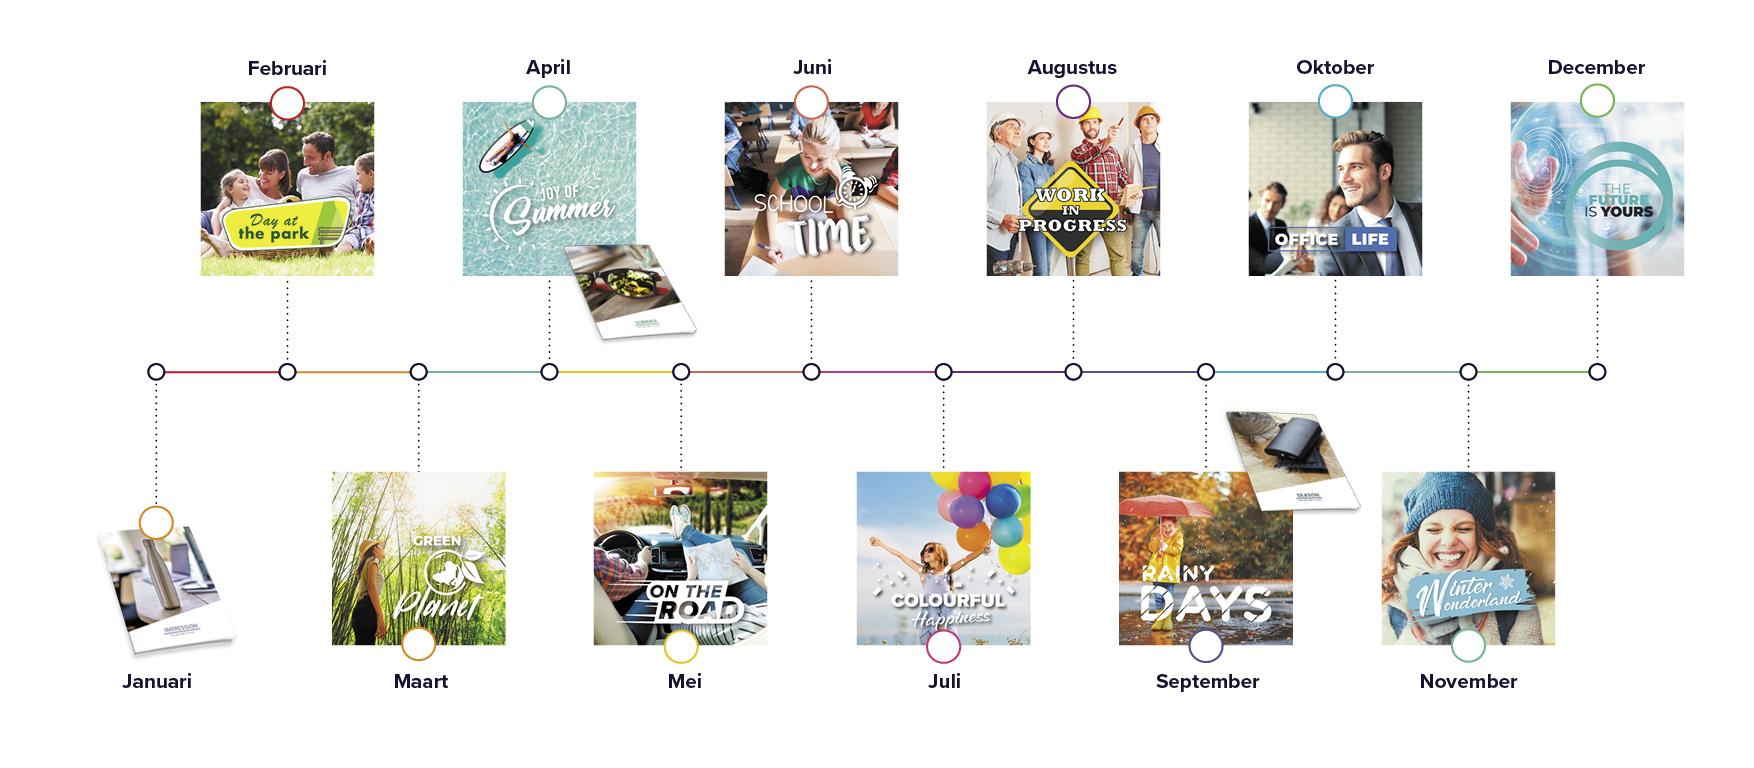 Theme timeline